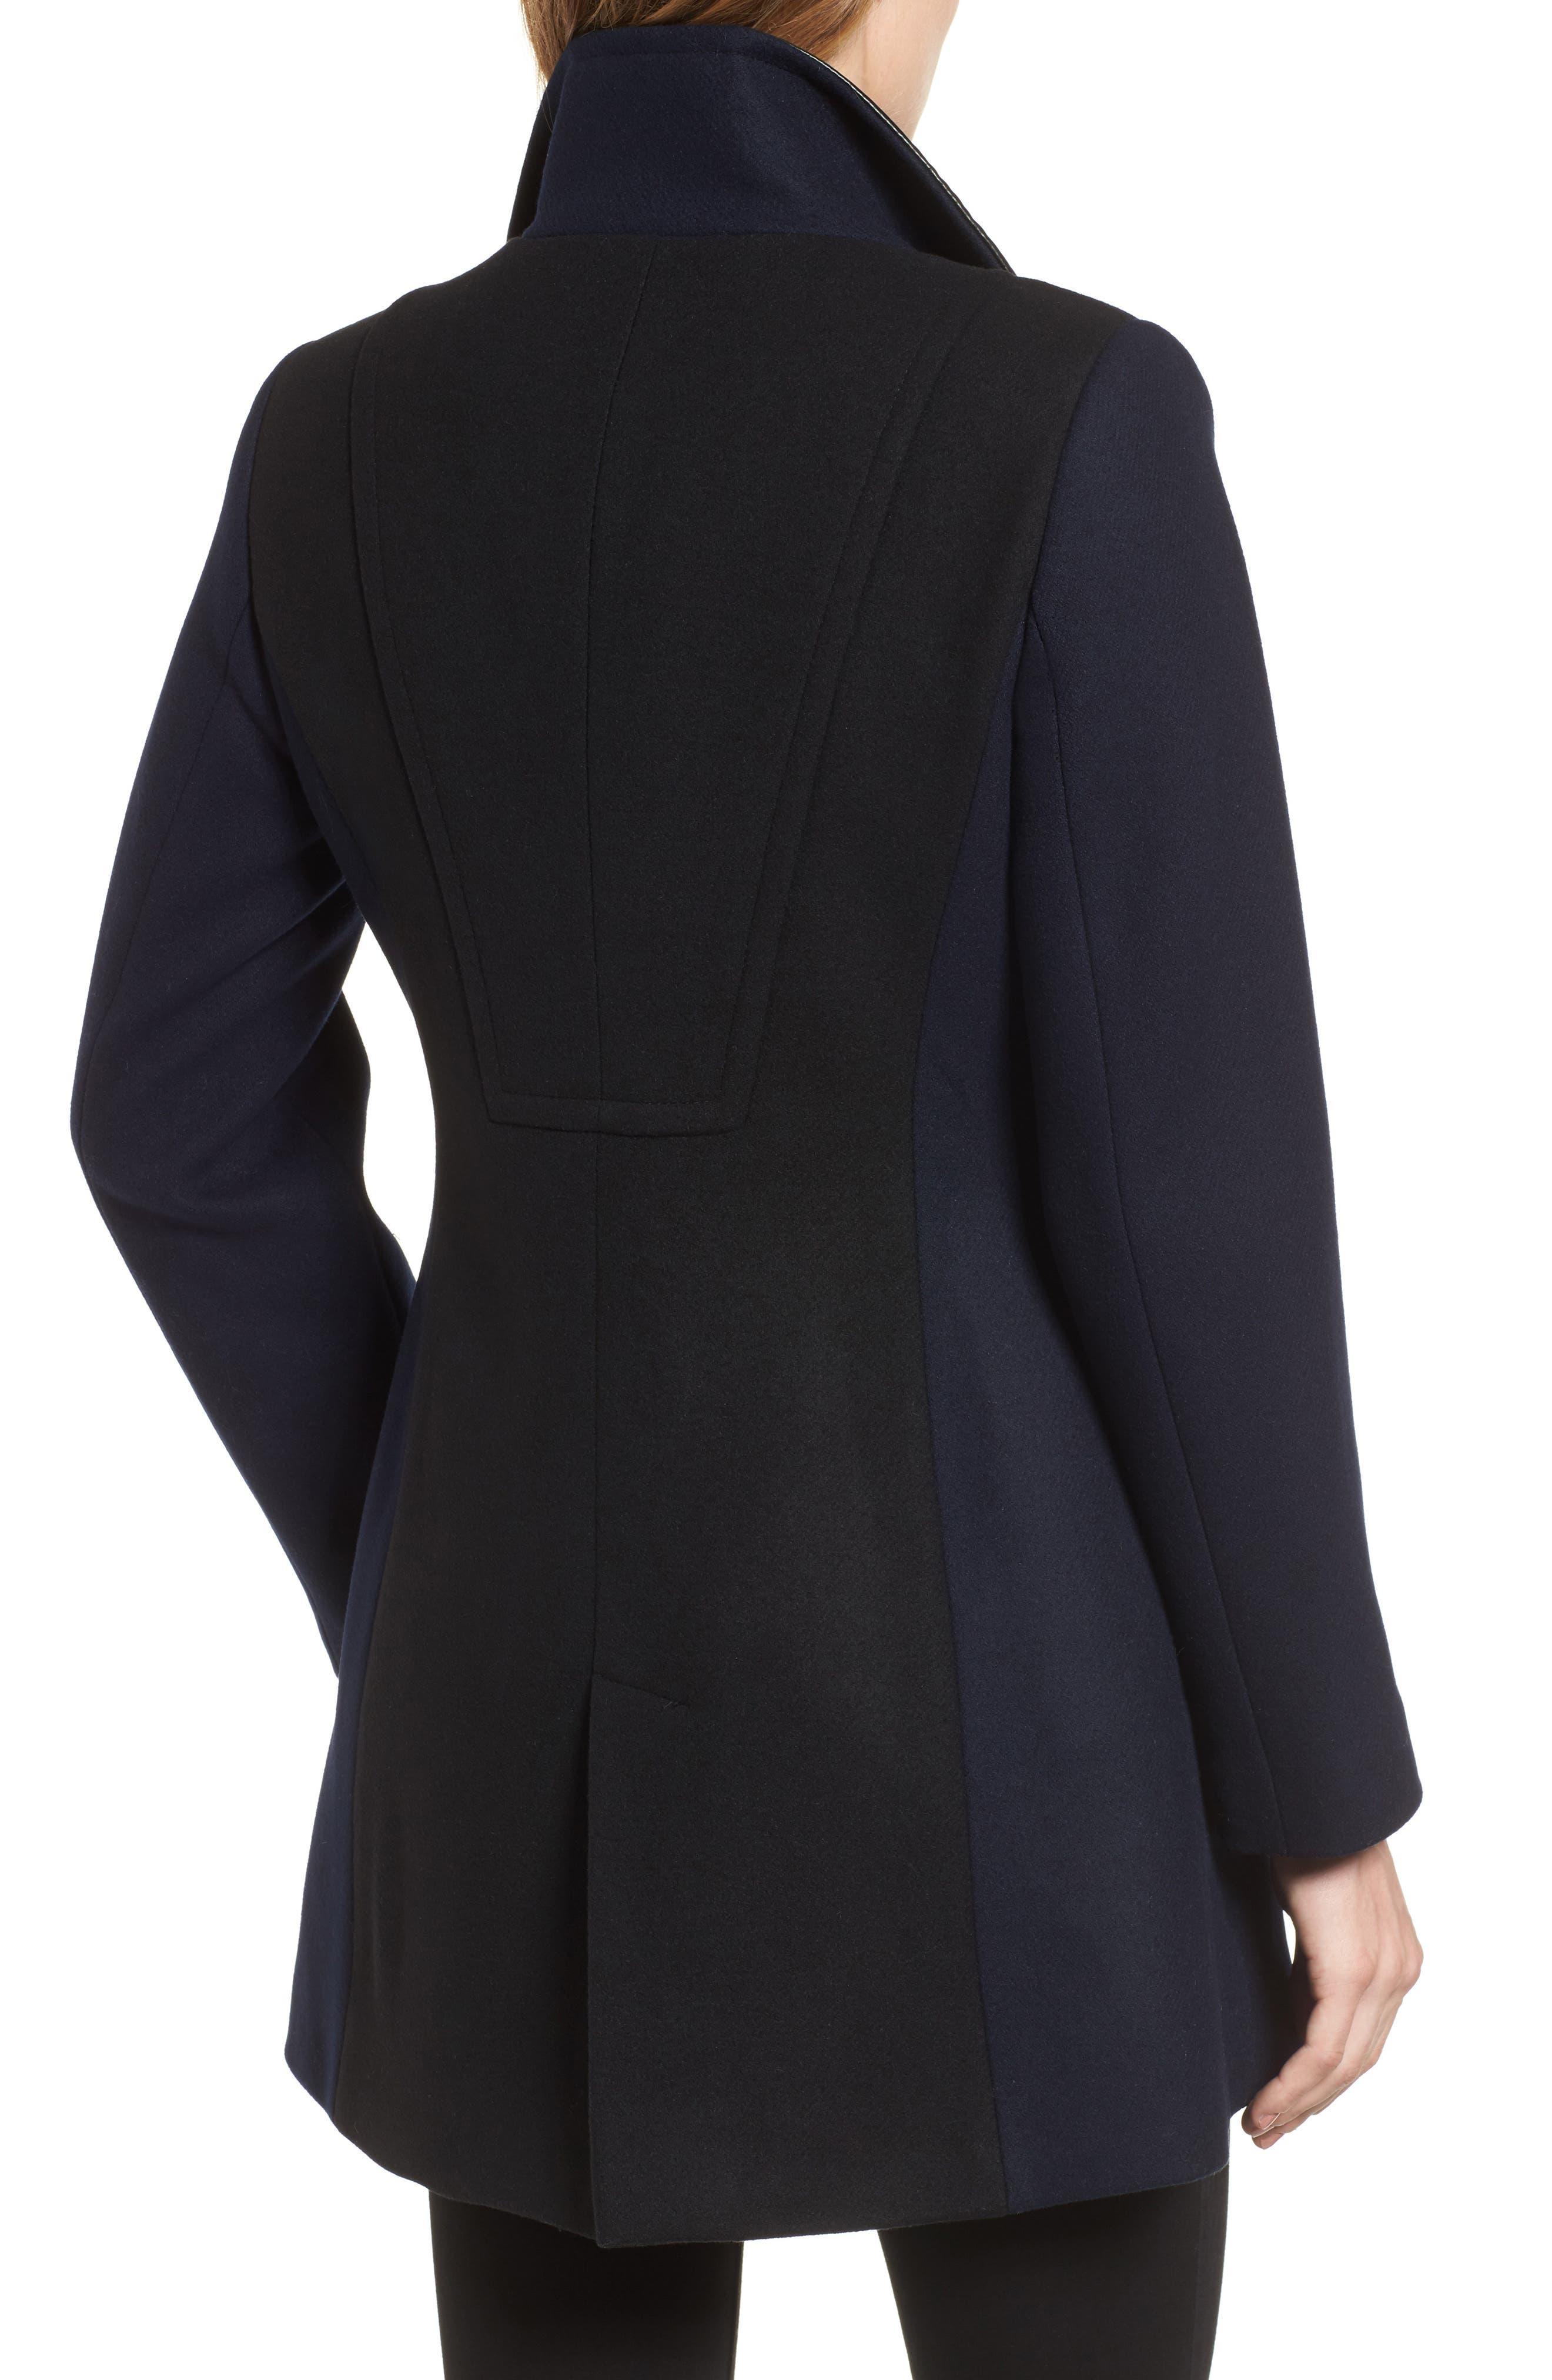 Eleanor Leather Trim Wool Blend Coat,                             Alternate thumbnail 2, color,                             002